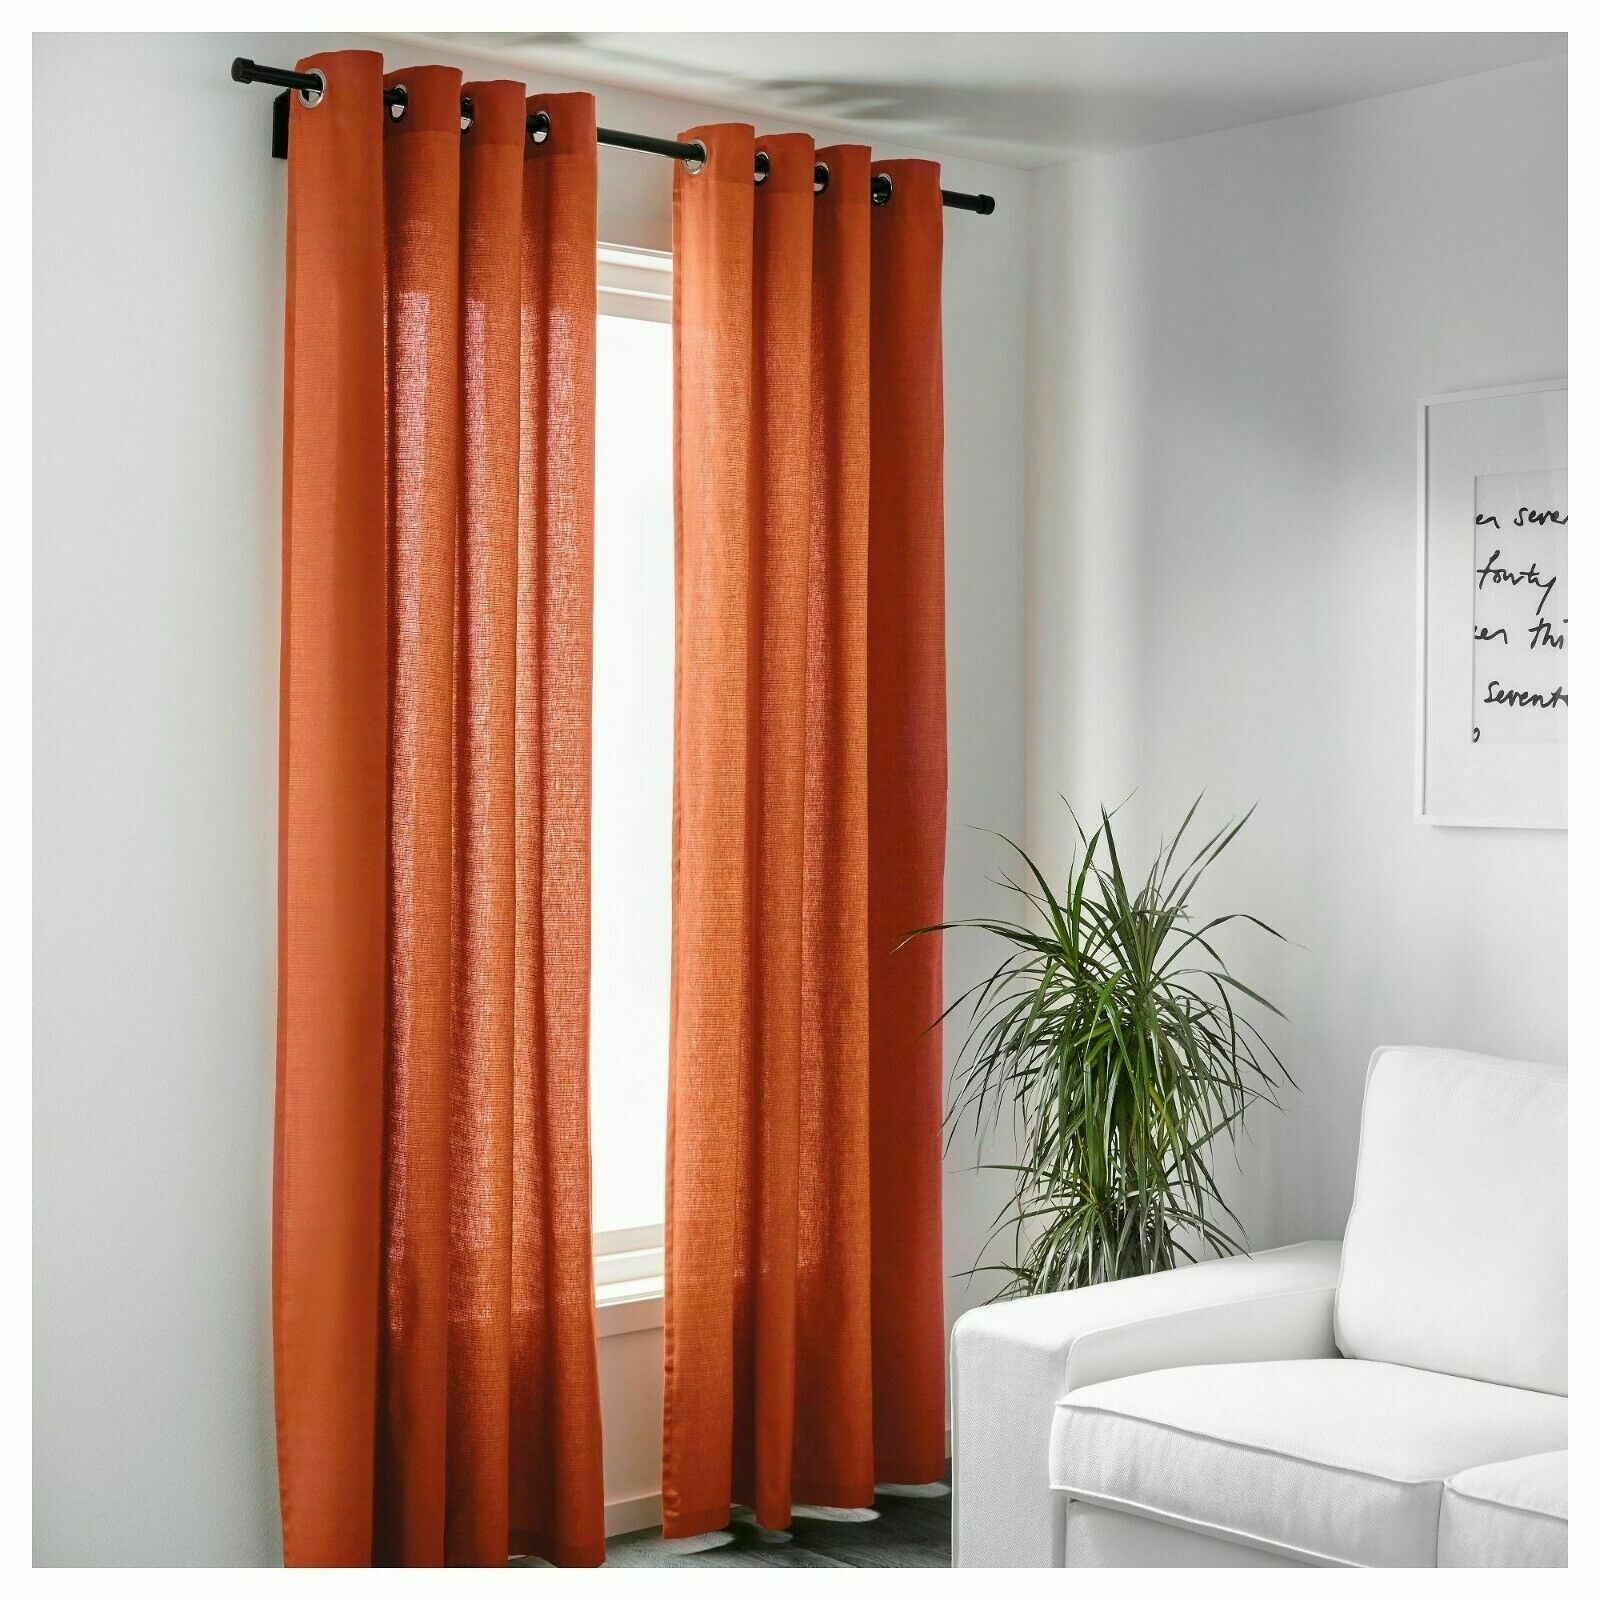 Mariam Orange Pair Of Curtains Cotton Ikea Curtain Panels 57x98 145x250cm For Sale Online